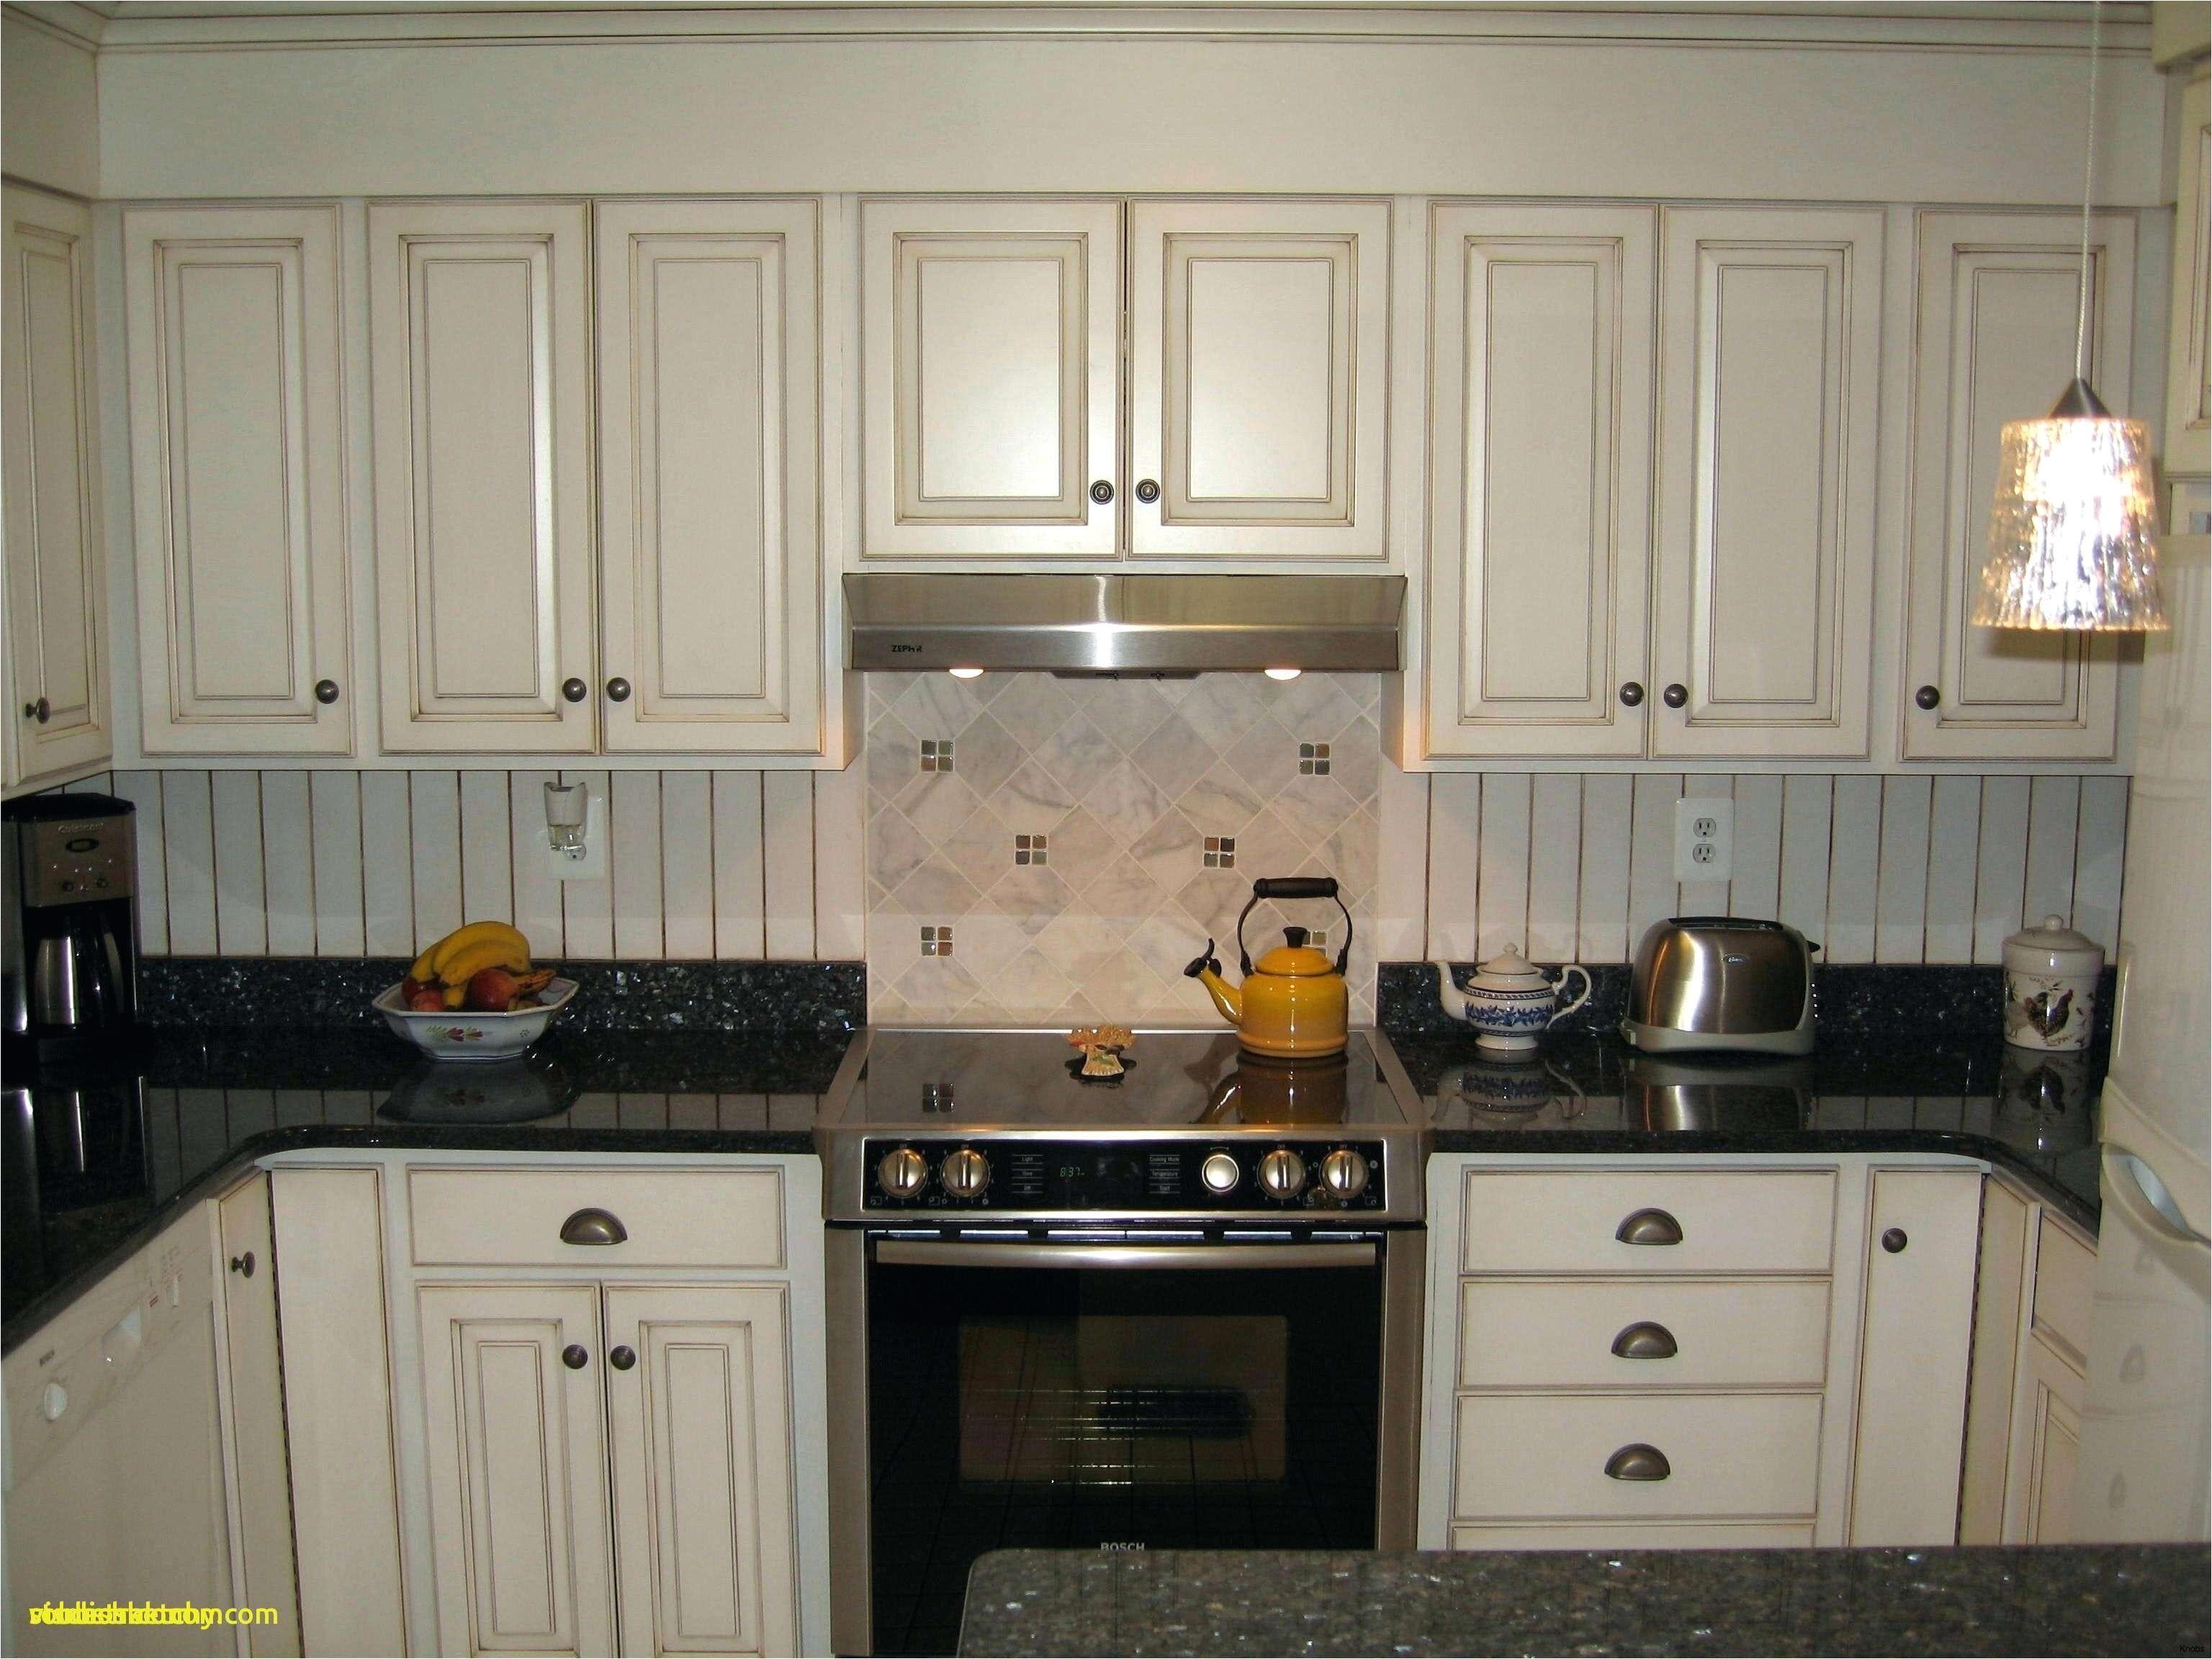 Kitchen Cabinets Hardware Idea Kitchen Cabinets New Kitchen Hardware Best Kitchen Hardware 0d